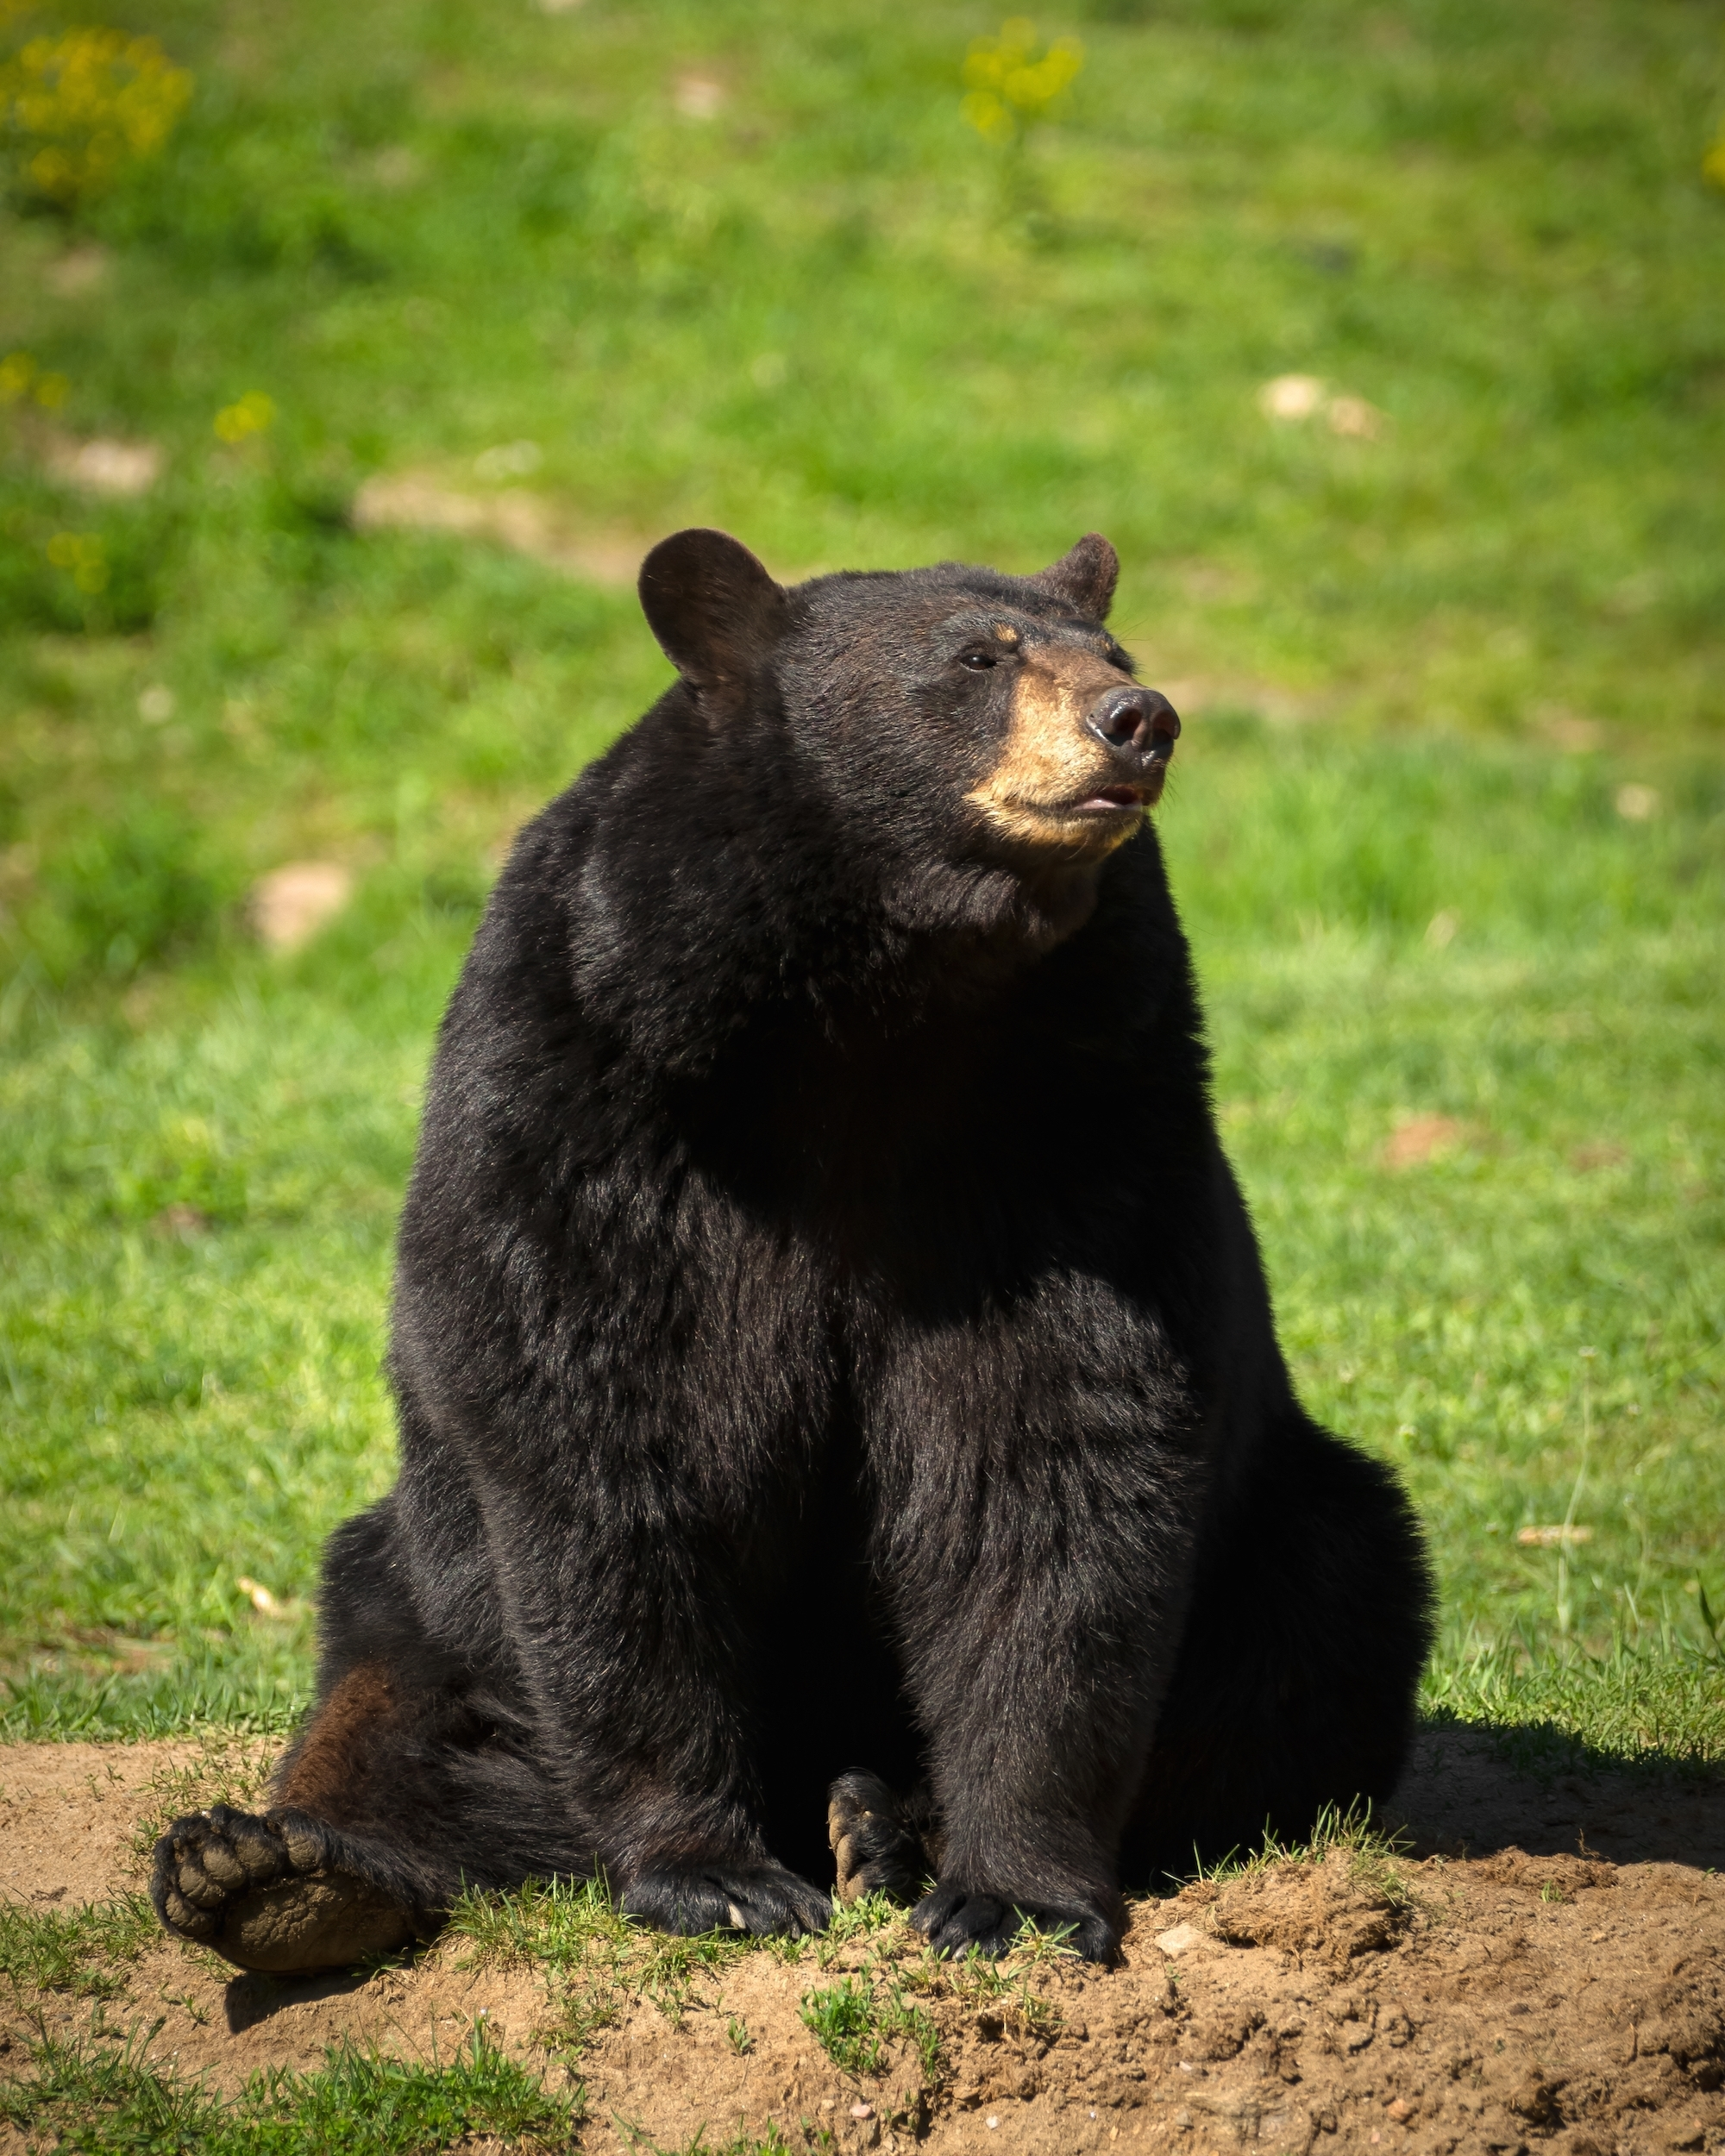 1859f4995c1f2403d389_Bear.jpg